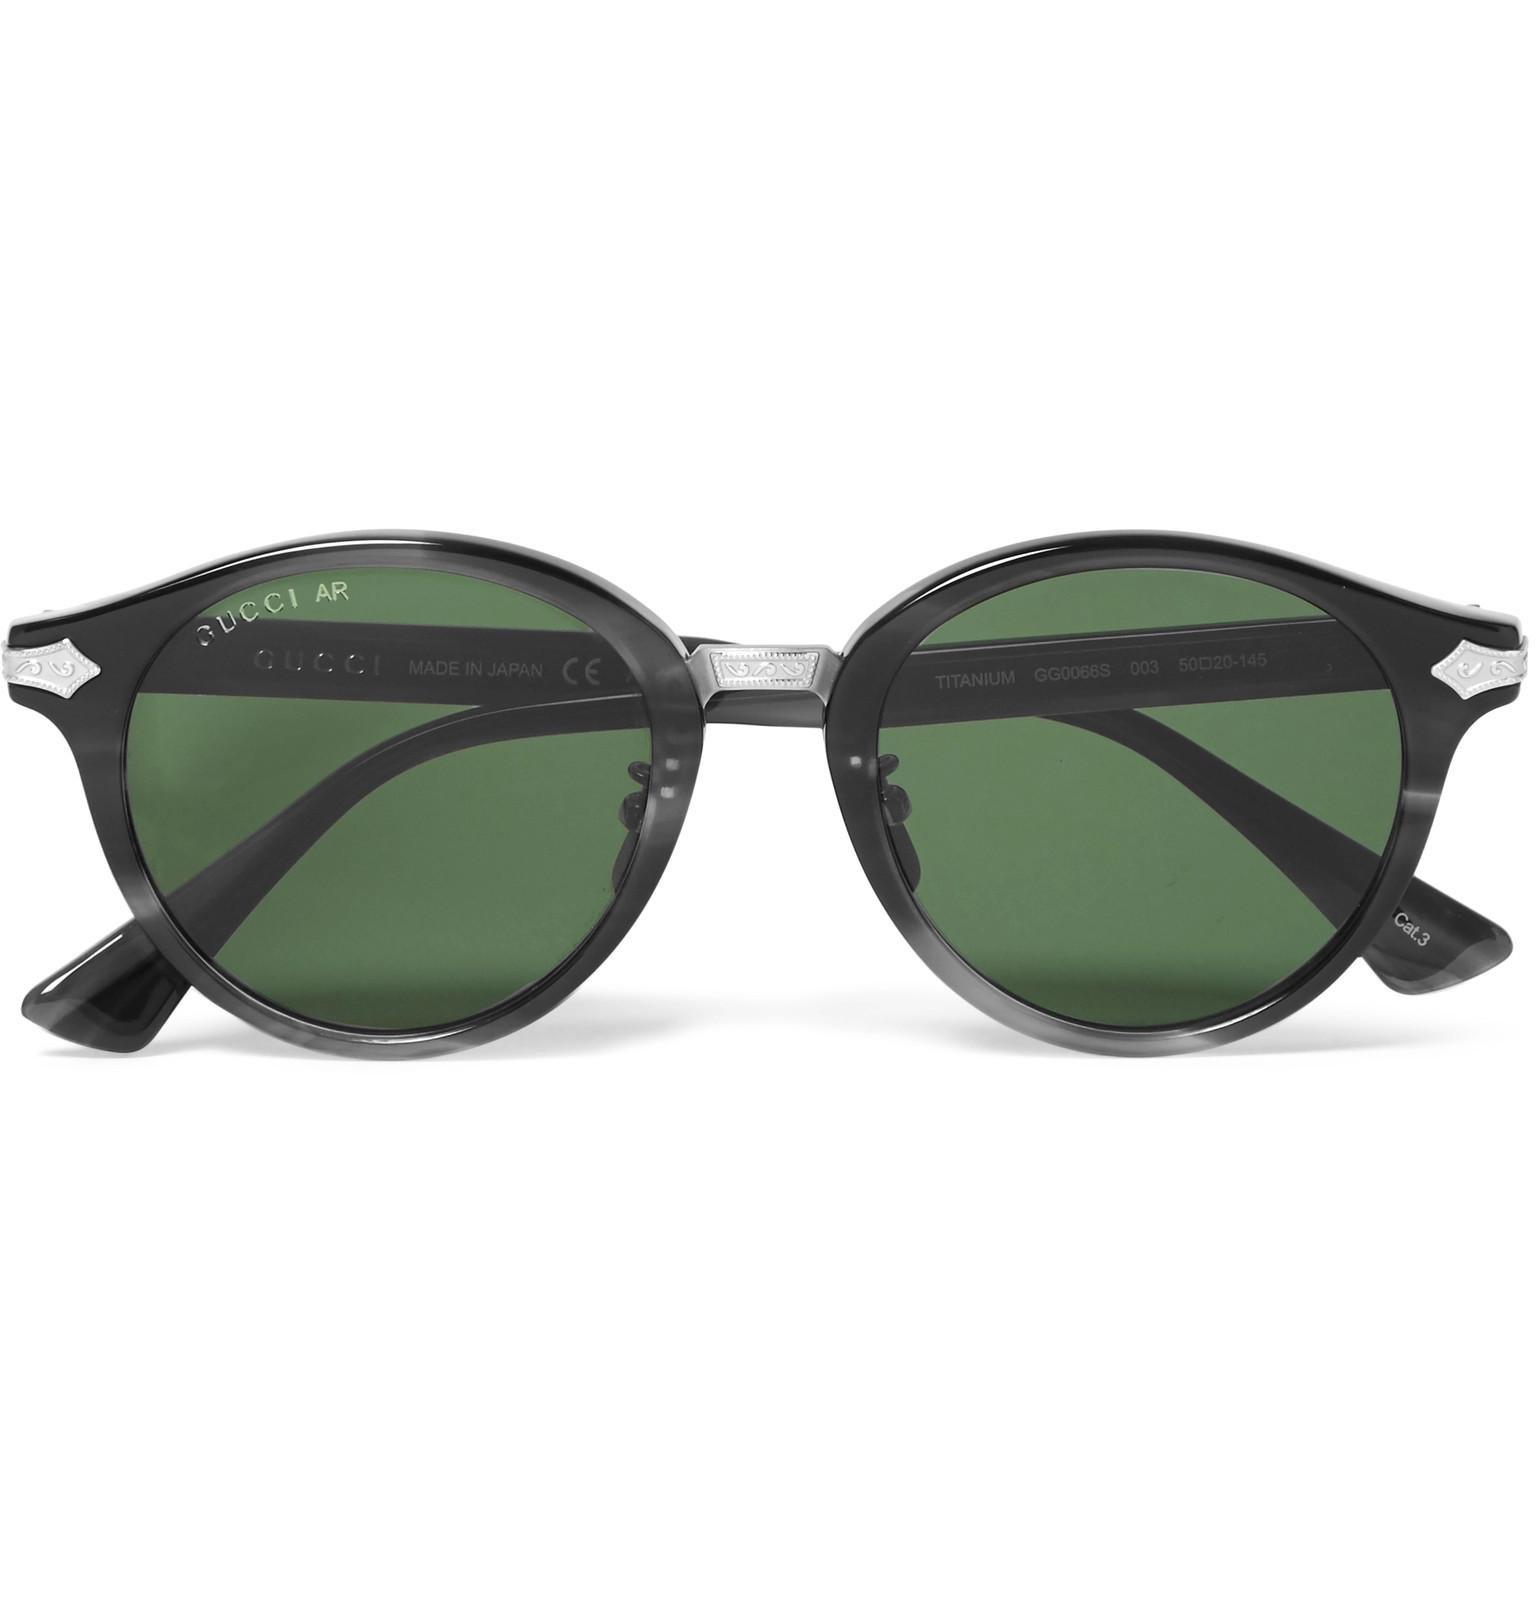 e15650a698 Gucci Round-frame Acetate And Titanium Sunglasses in Green for Men